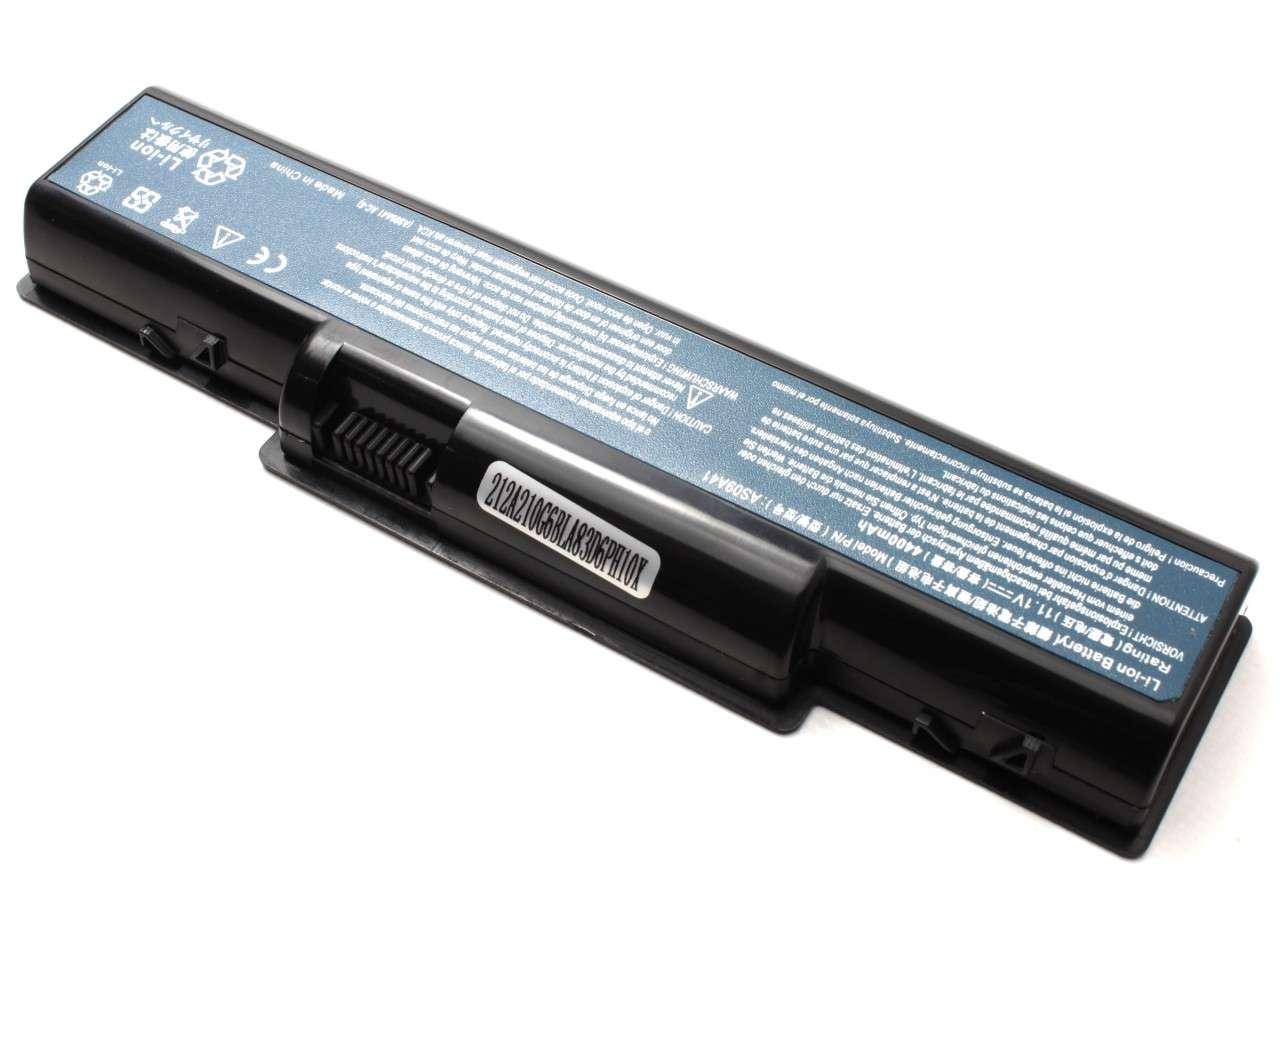 Baterie Acer Aspire 4530 Ver.2 imagine powerlaptop.ro 2021